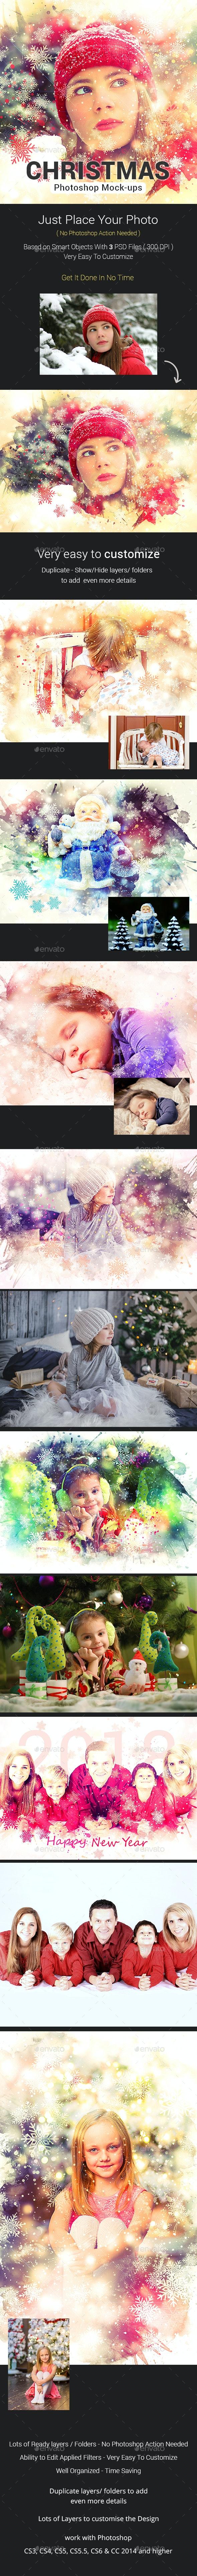 Christmas Photoshop Template Mock-Ups - Photo Templates Graphics